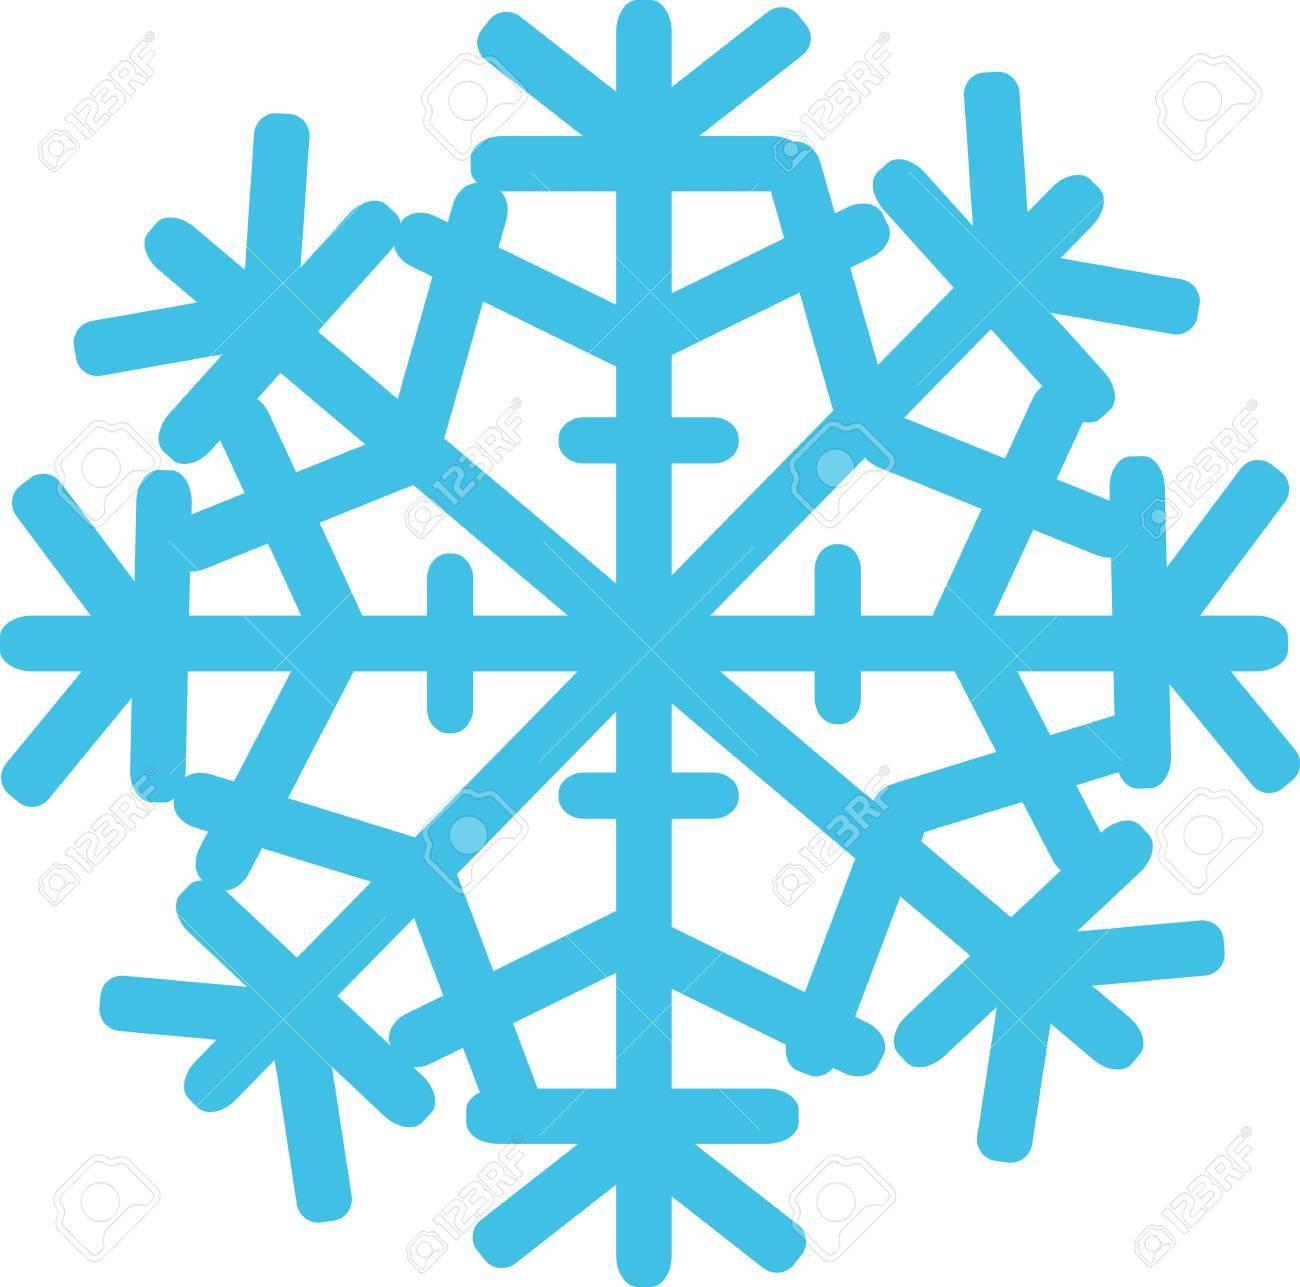 Hell~~POS=TRUNC Schnee~~POS=TRUNC Flocke~~POS=HEADCOMP Lizenzfrei ...